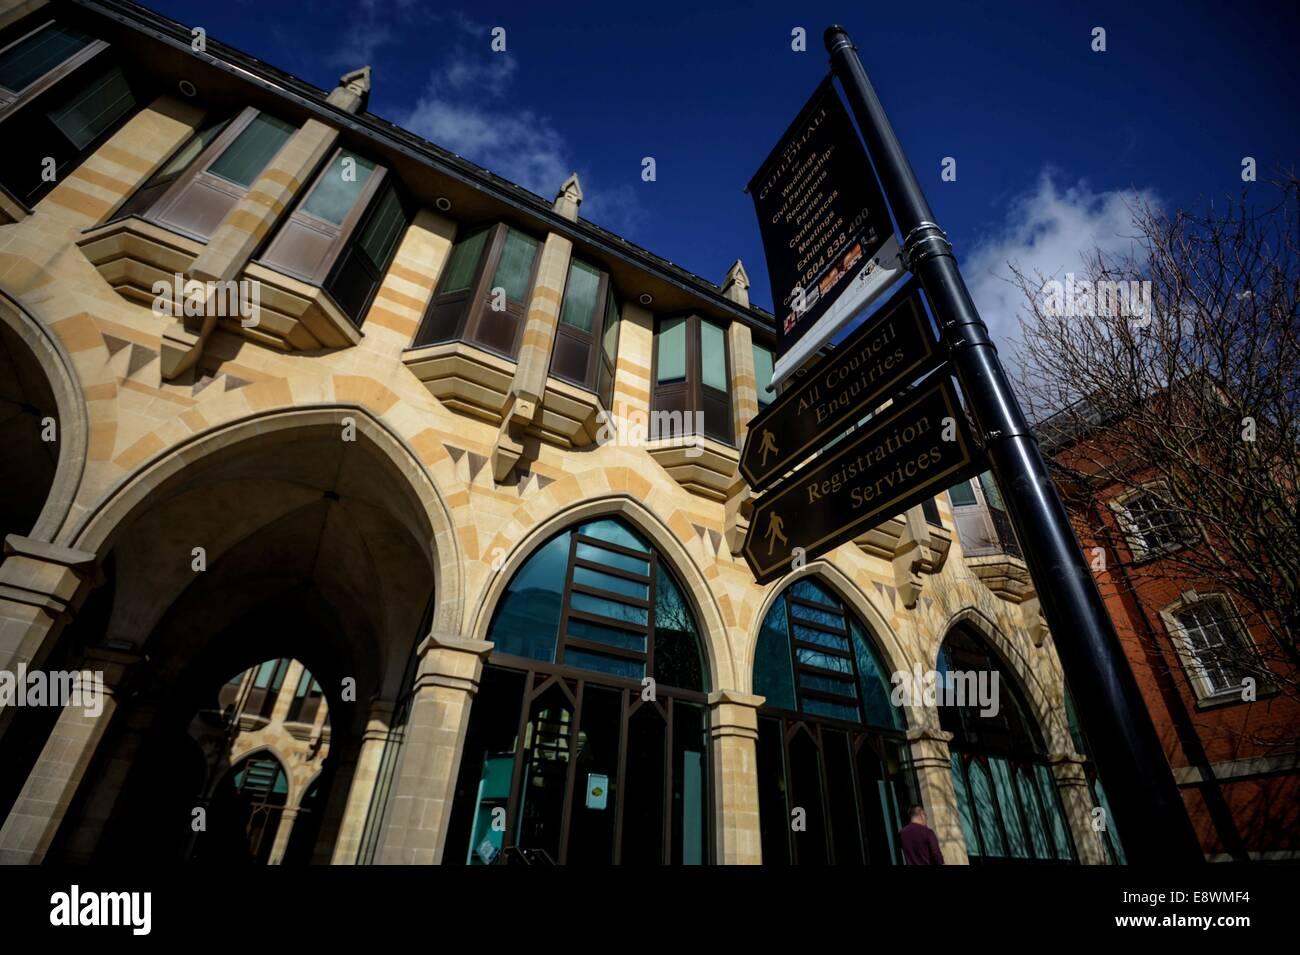 The Guildhall on St Giles Square, Northampton, England - Stock Image